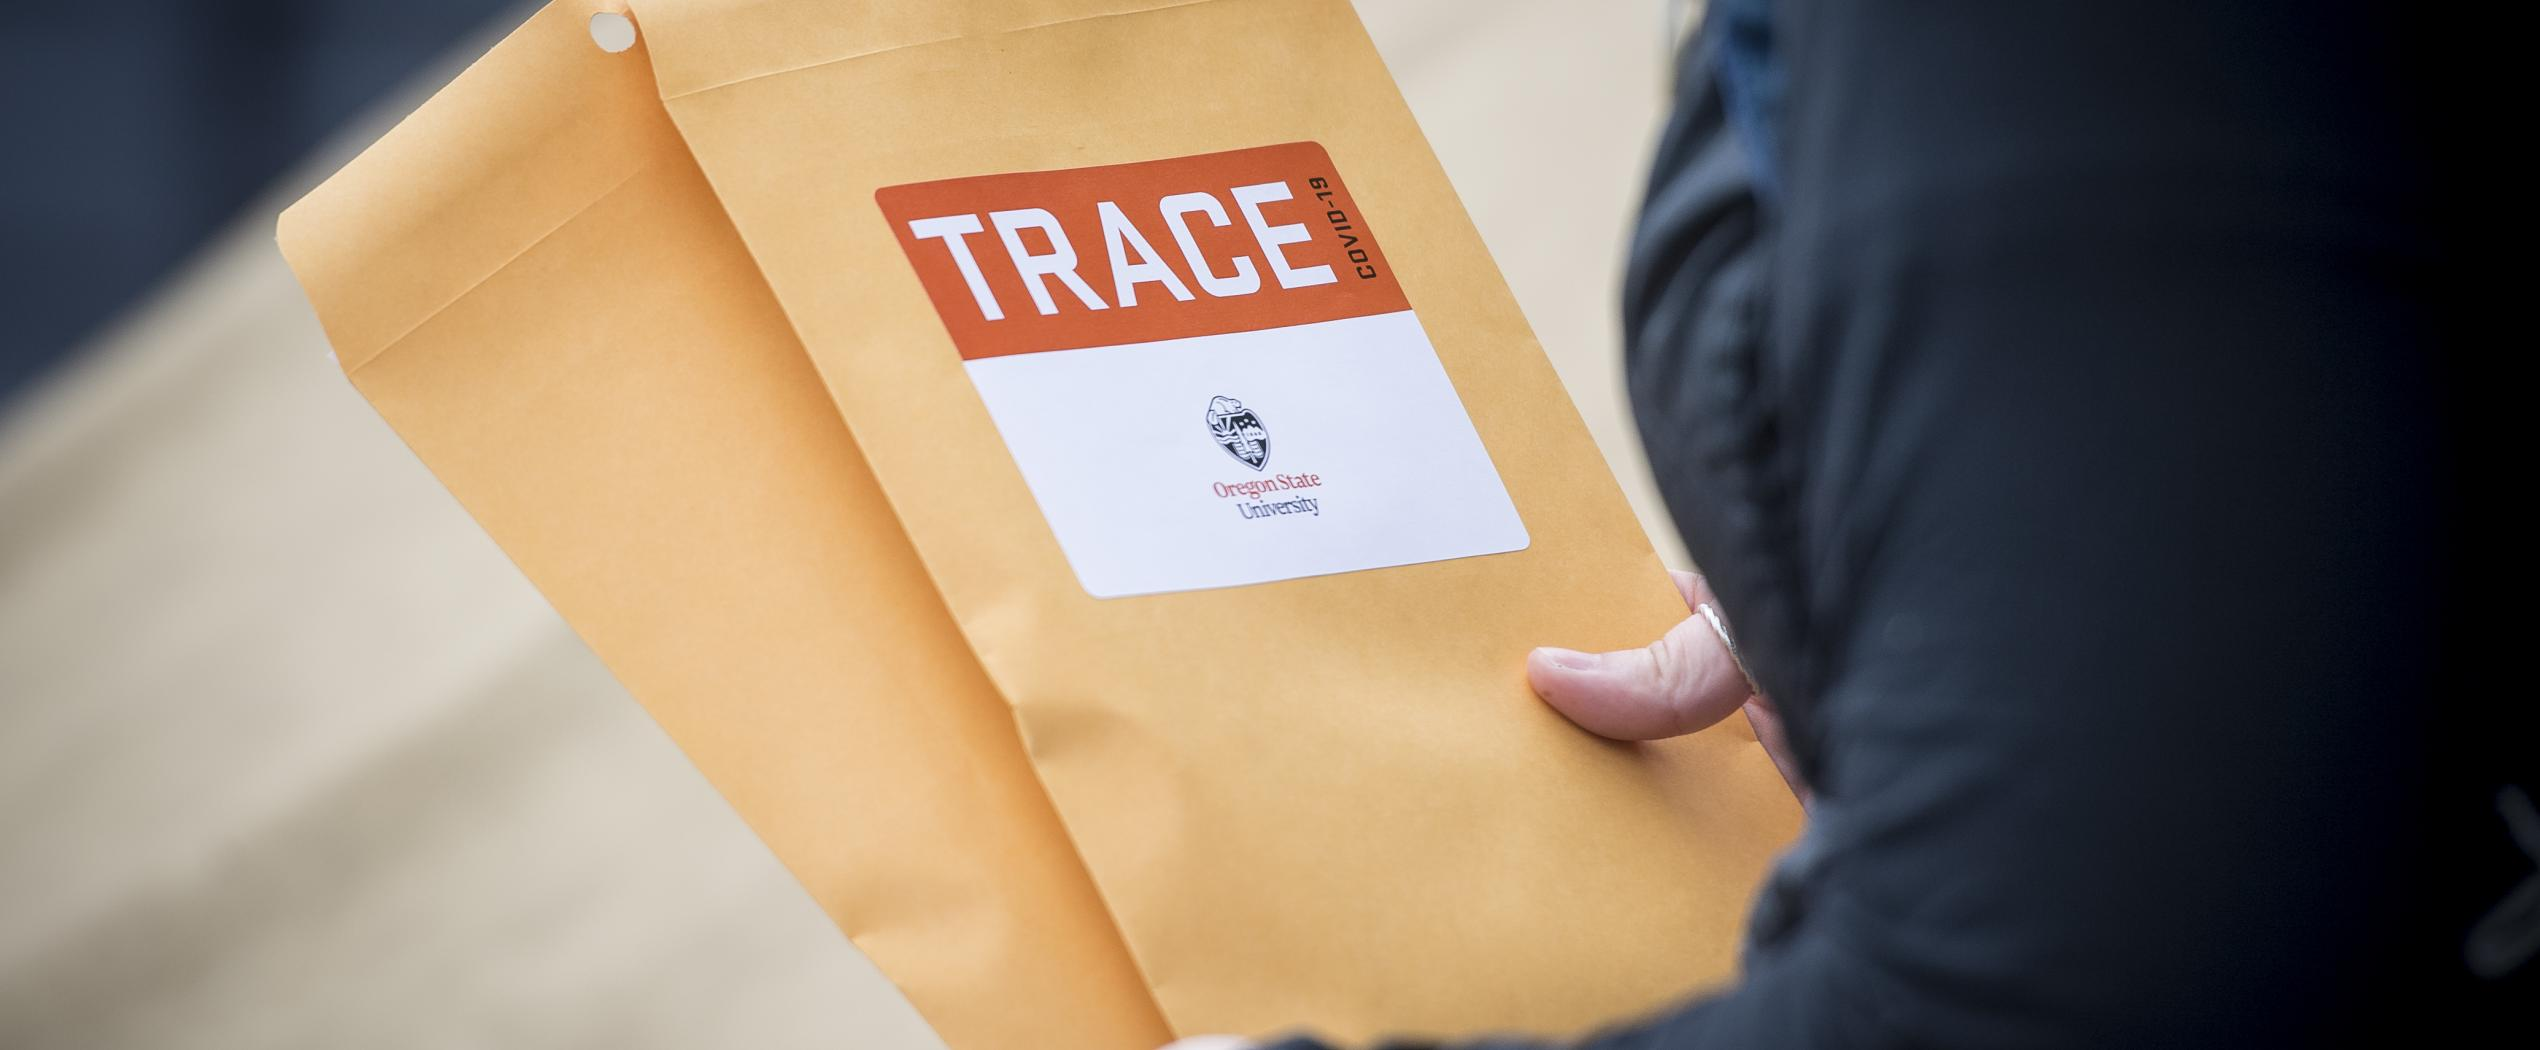 A TRACE volunteer holds envelopes